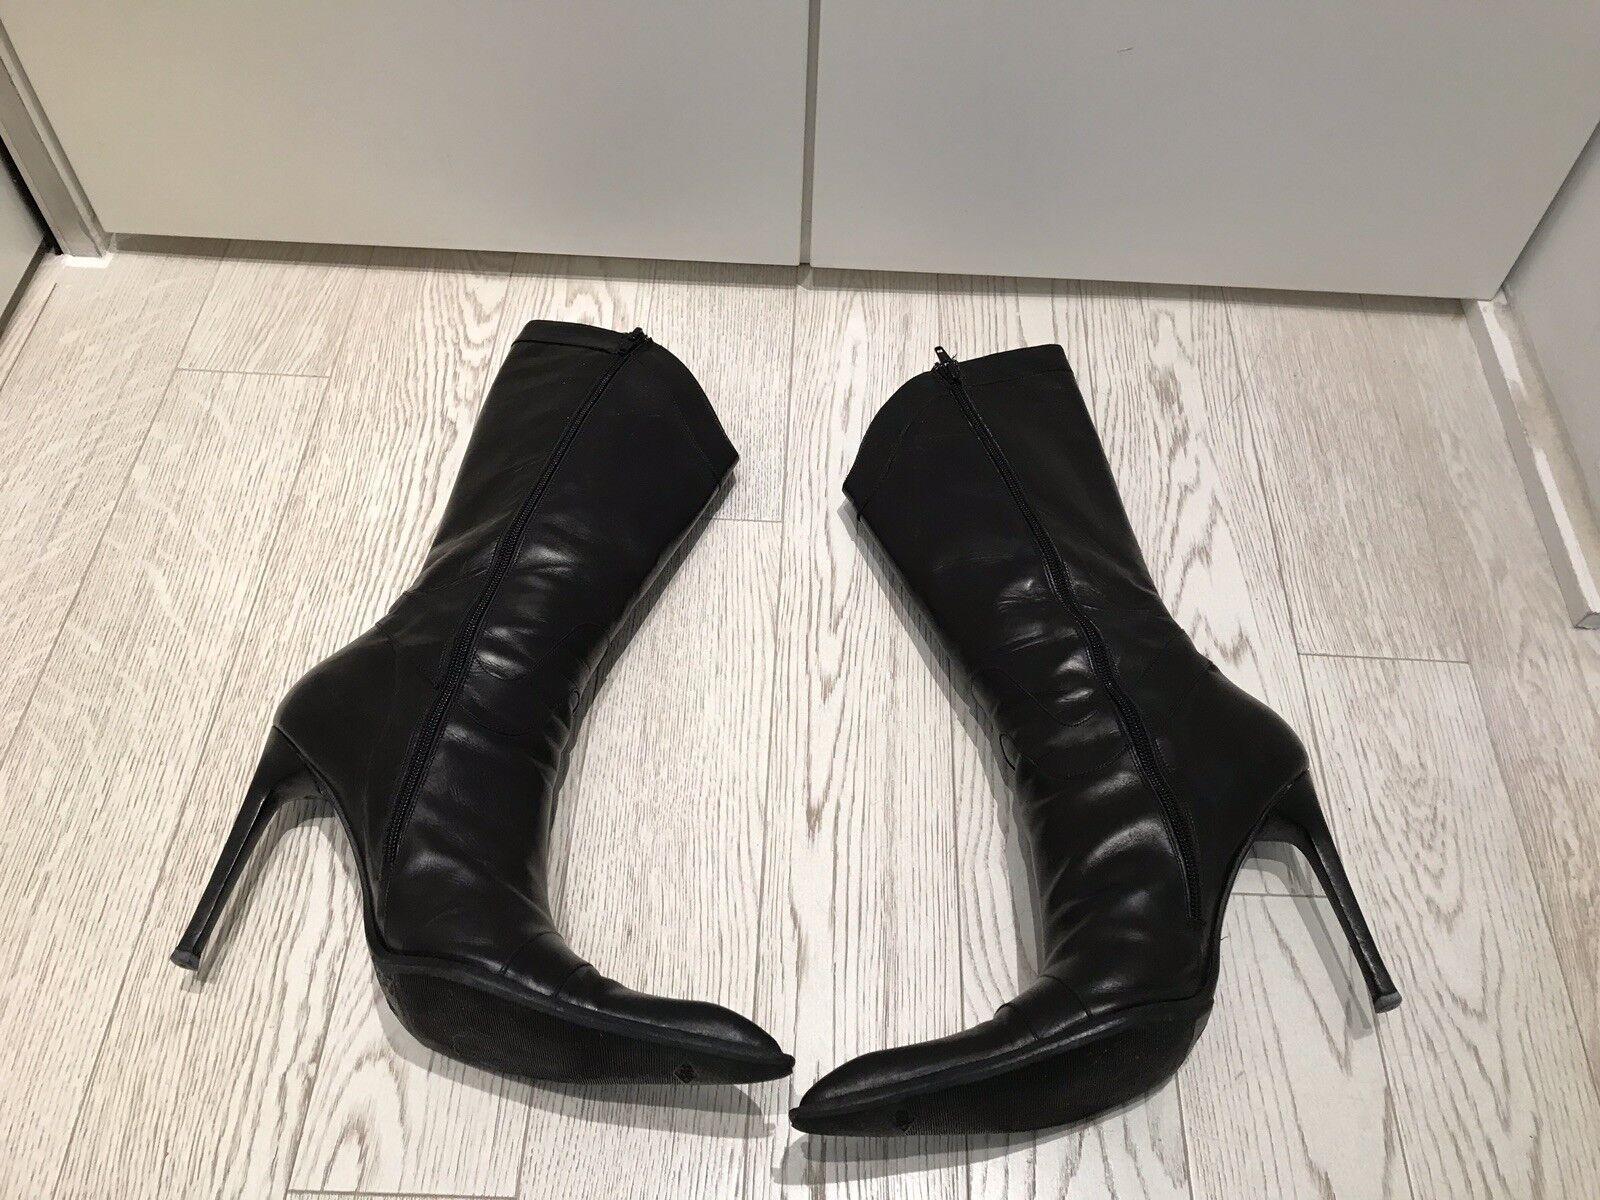 Stiefel damen Tacco 10 Numero 39 39 39 Giancarlo Paoli 15709d